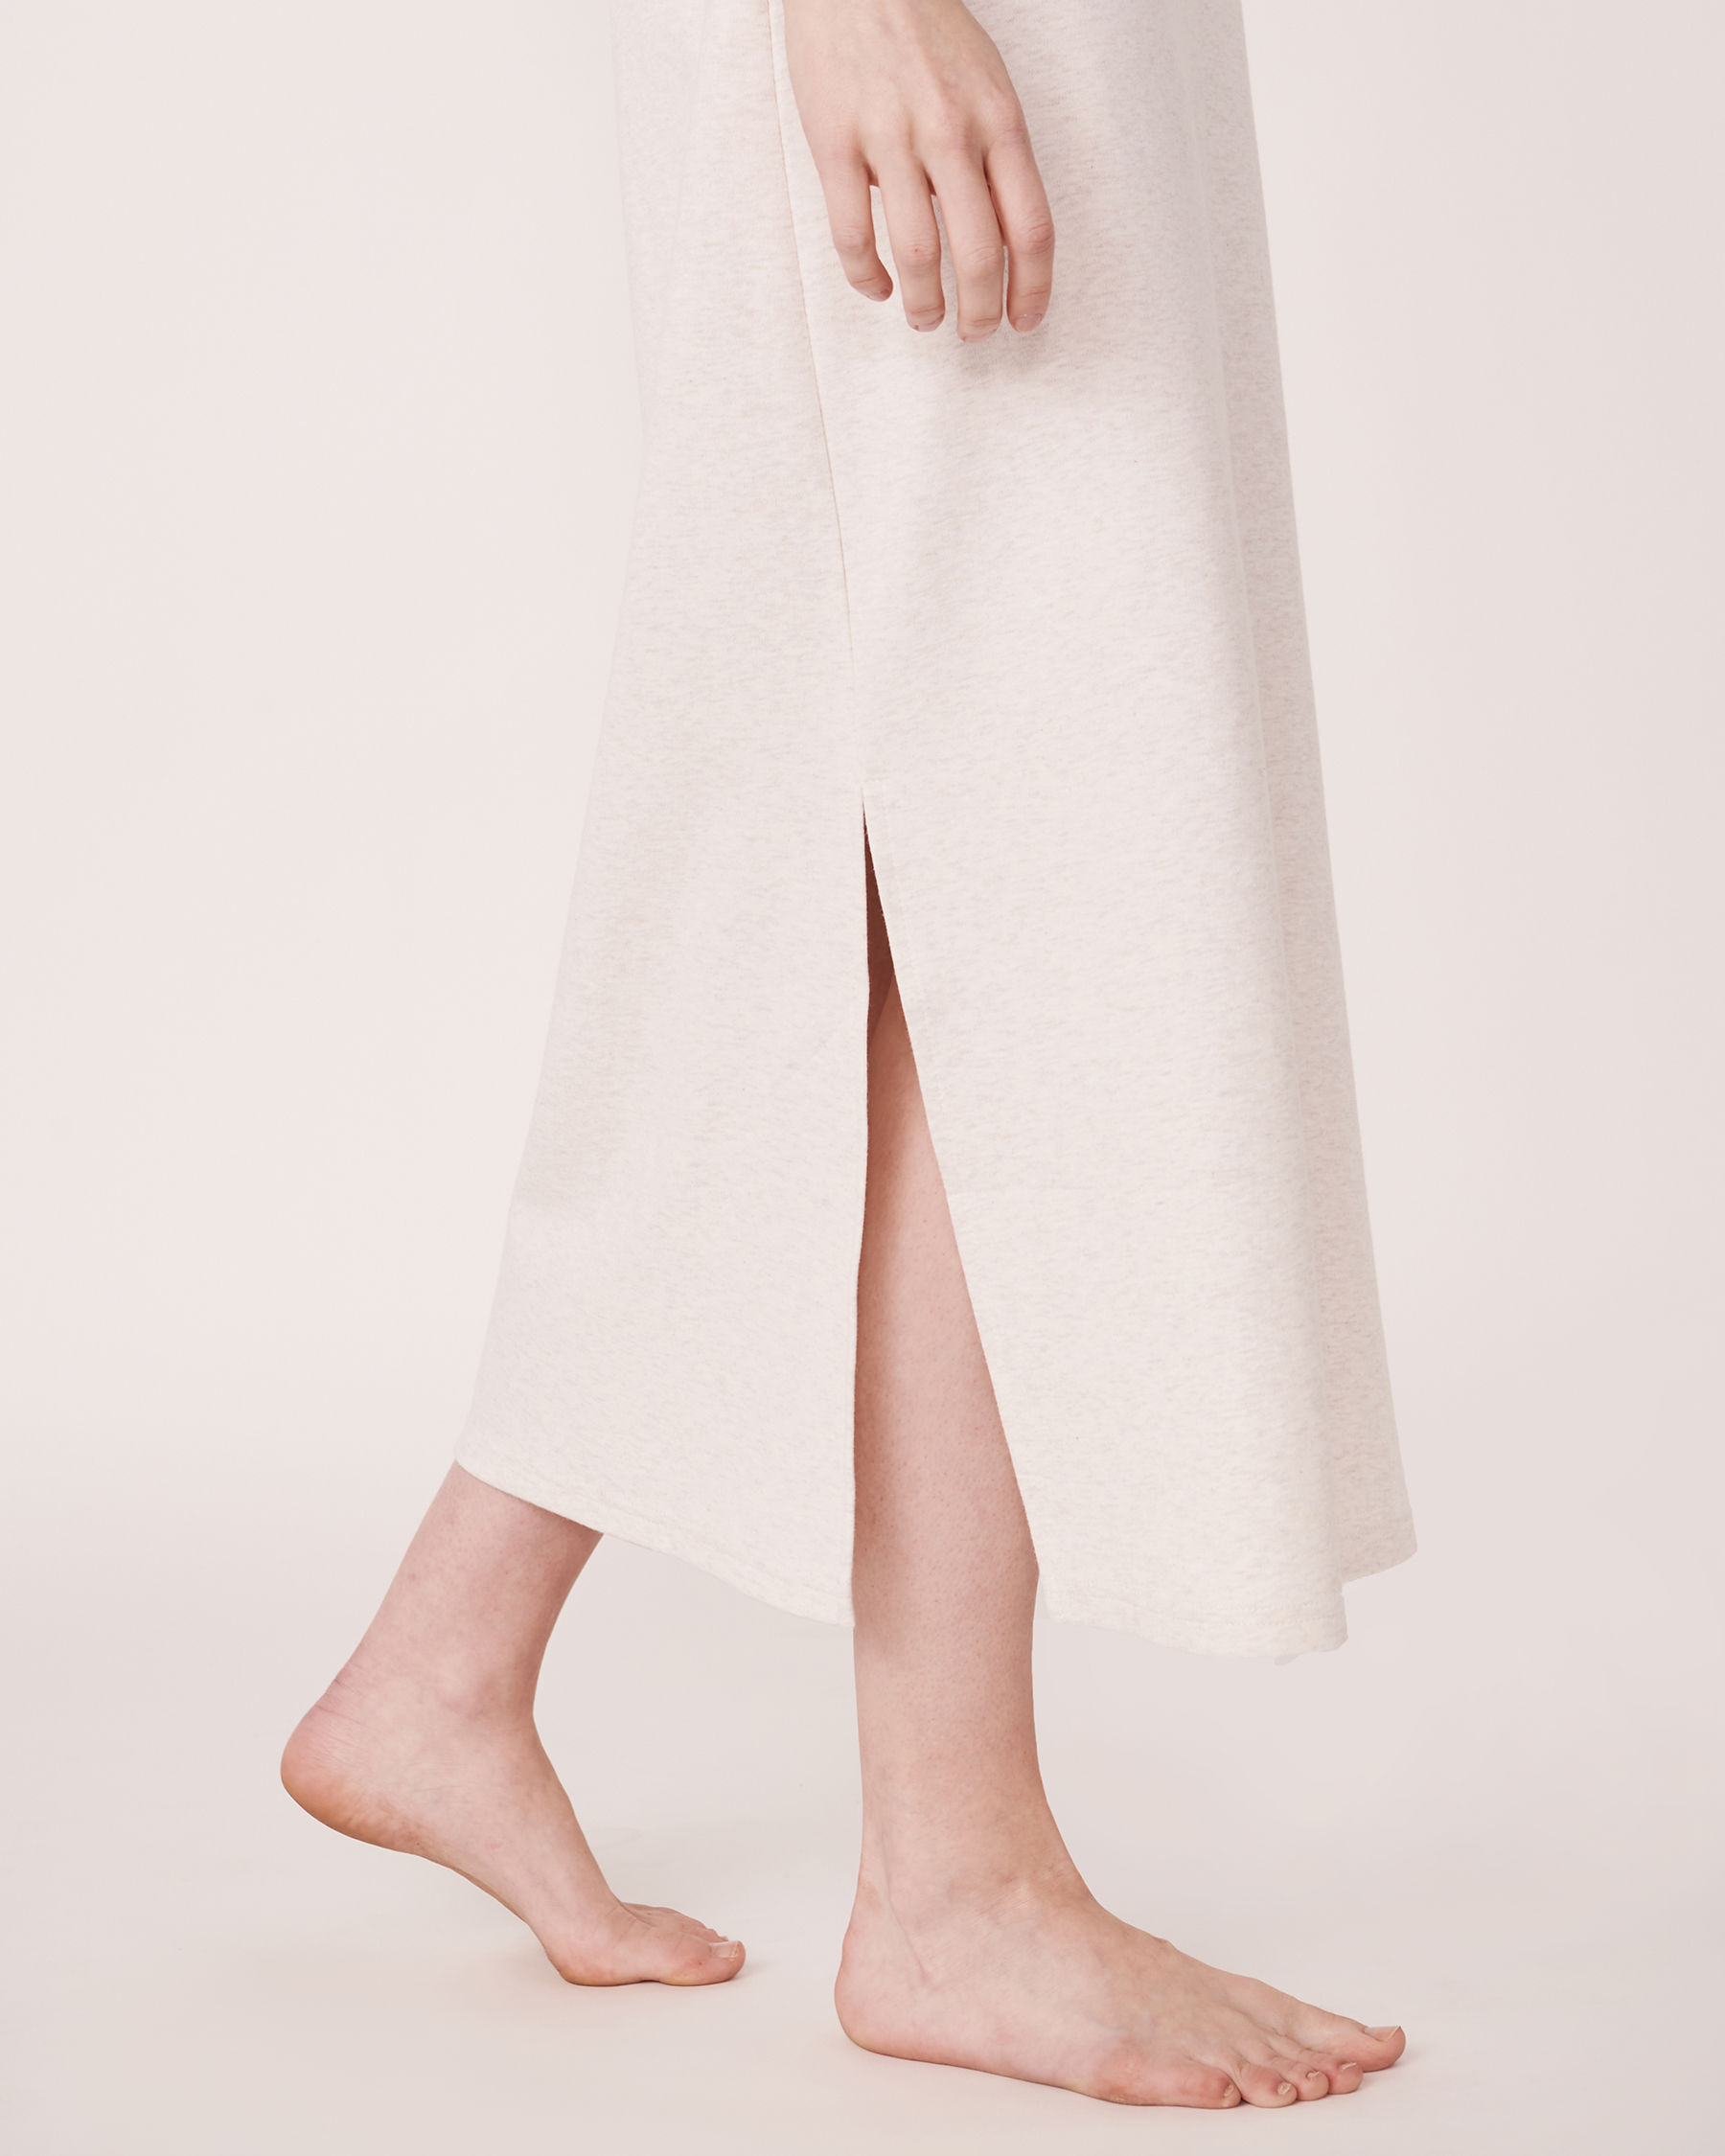 LA VIE EN ROSE Organic Cotton Sleeveless Long Sleepshirt Soft grey 40500002 - View5